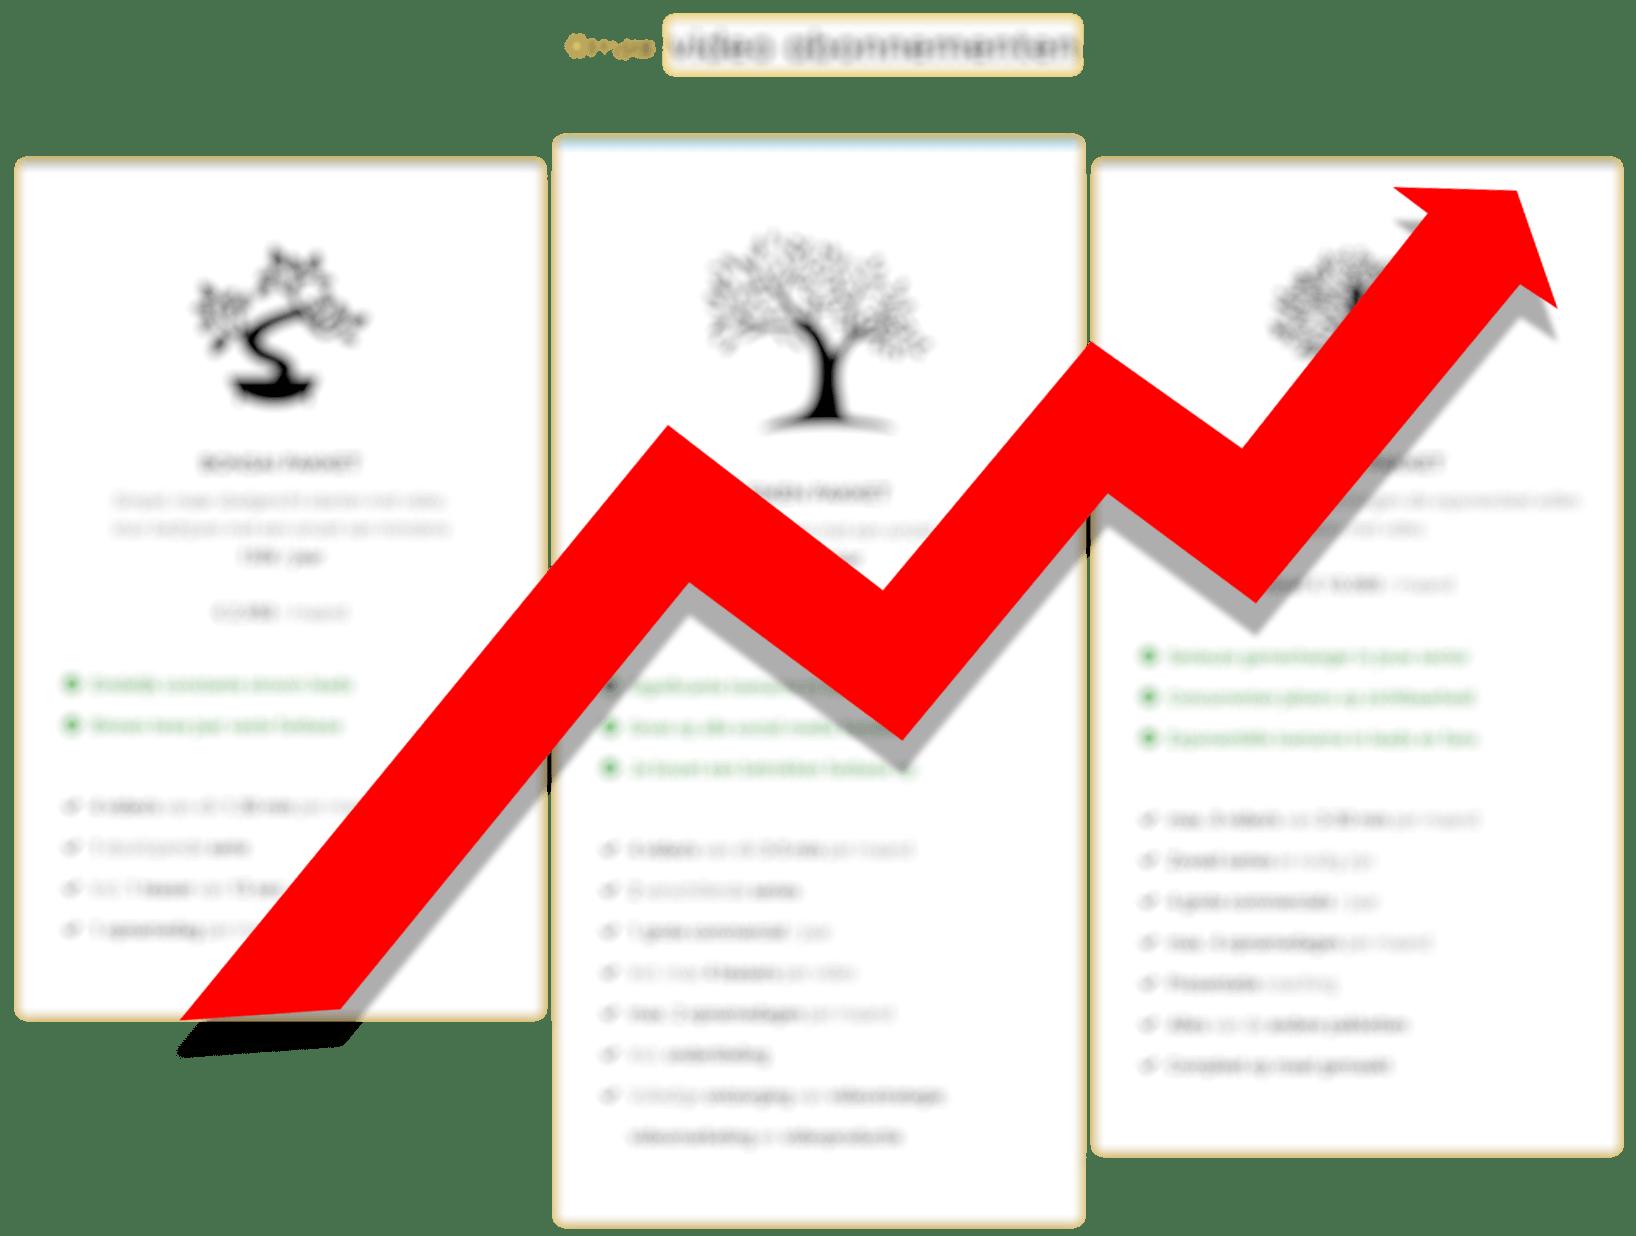 abonnementen grow media